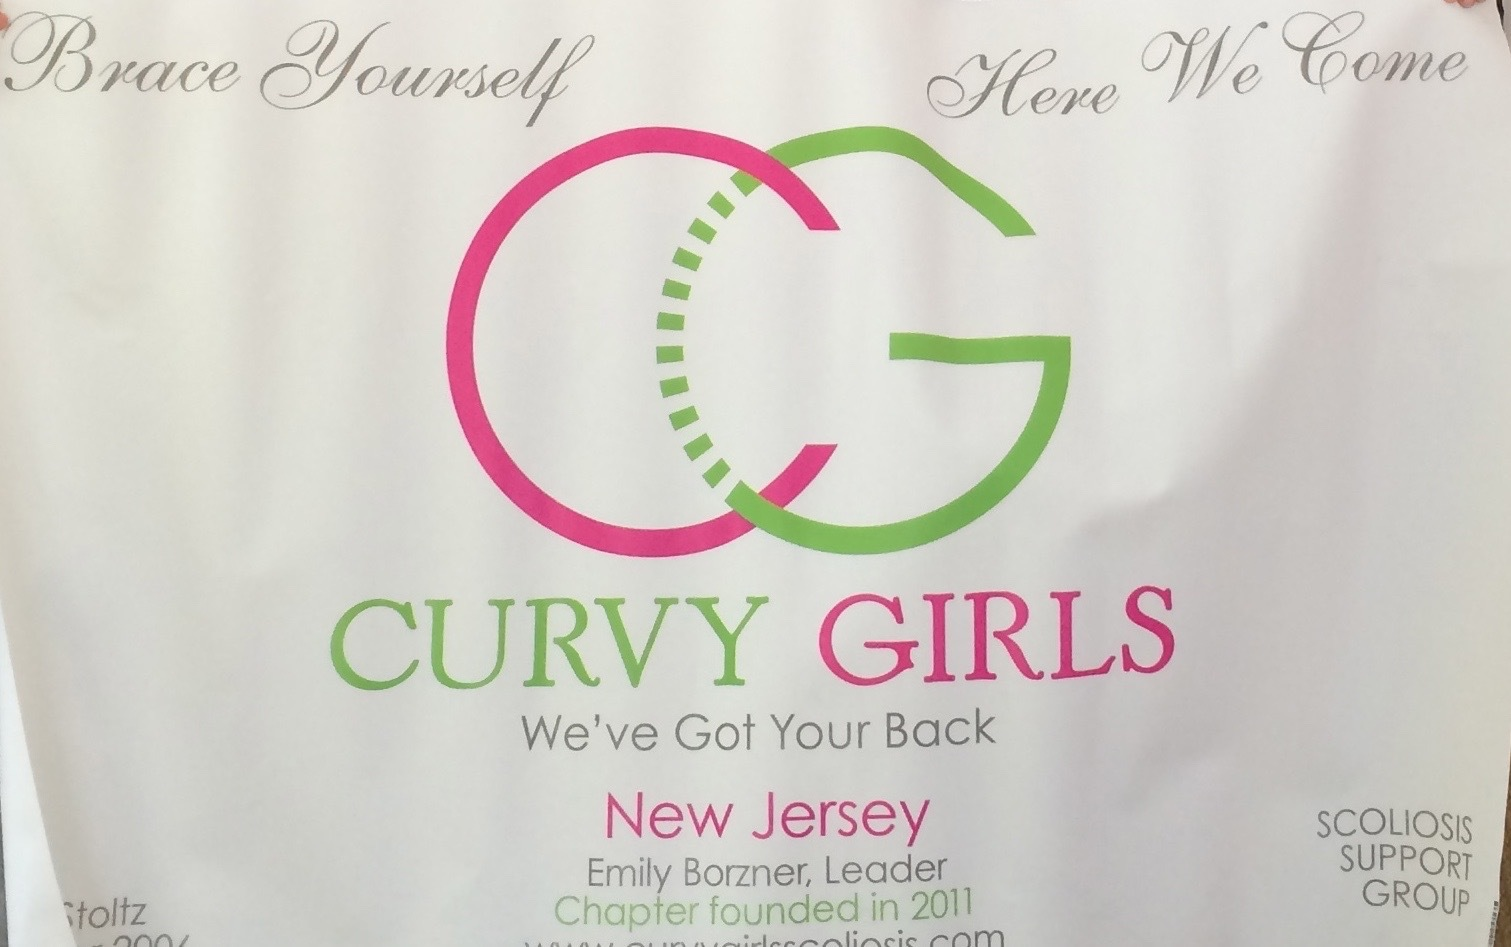 c055e80ea77514919efd_Curvy_Girls_Photo_Press_Release.jpg